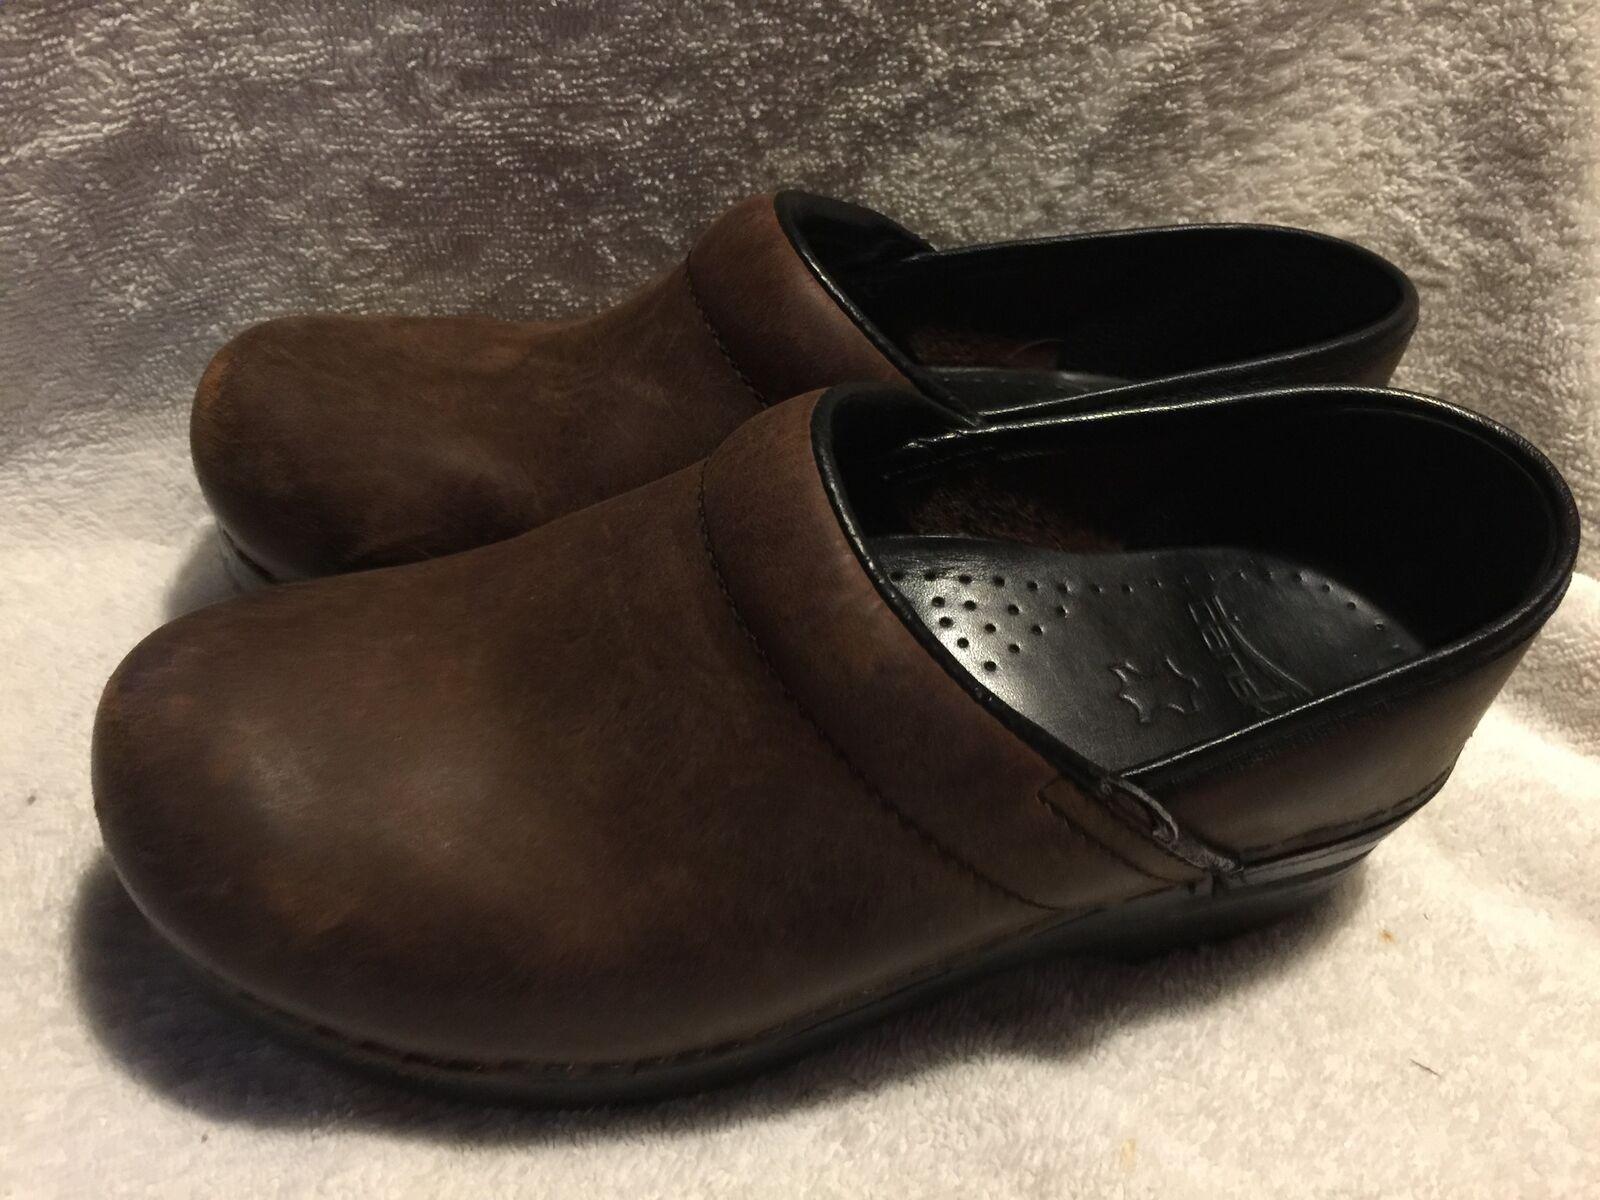 Used Worn Dansko Womens Clogs Loafers Euro Sz 37 USA sz 6.5 Brown Leather